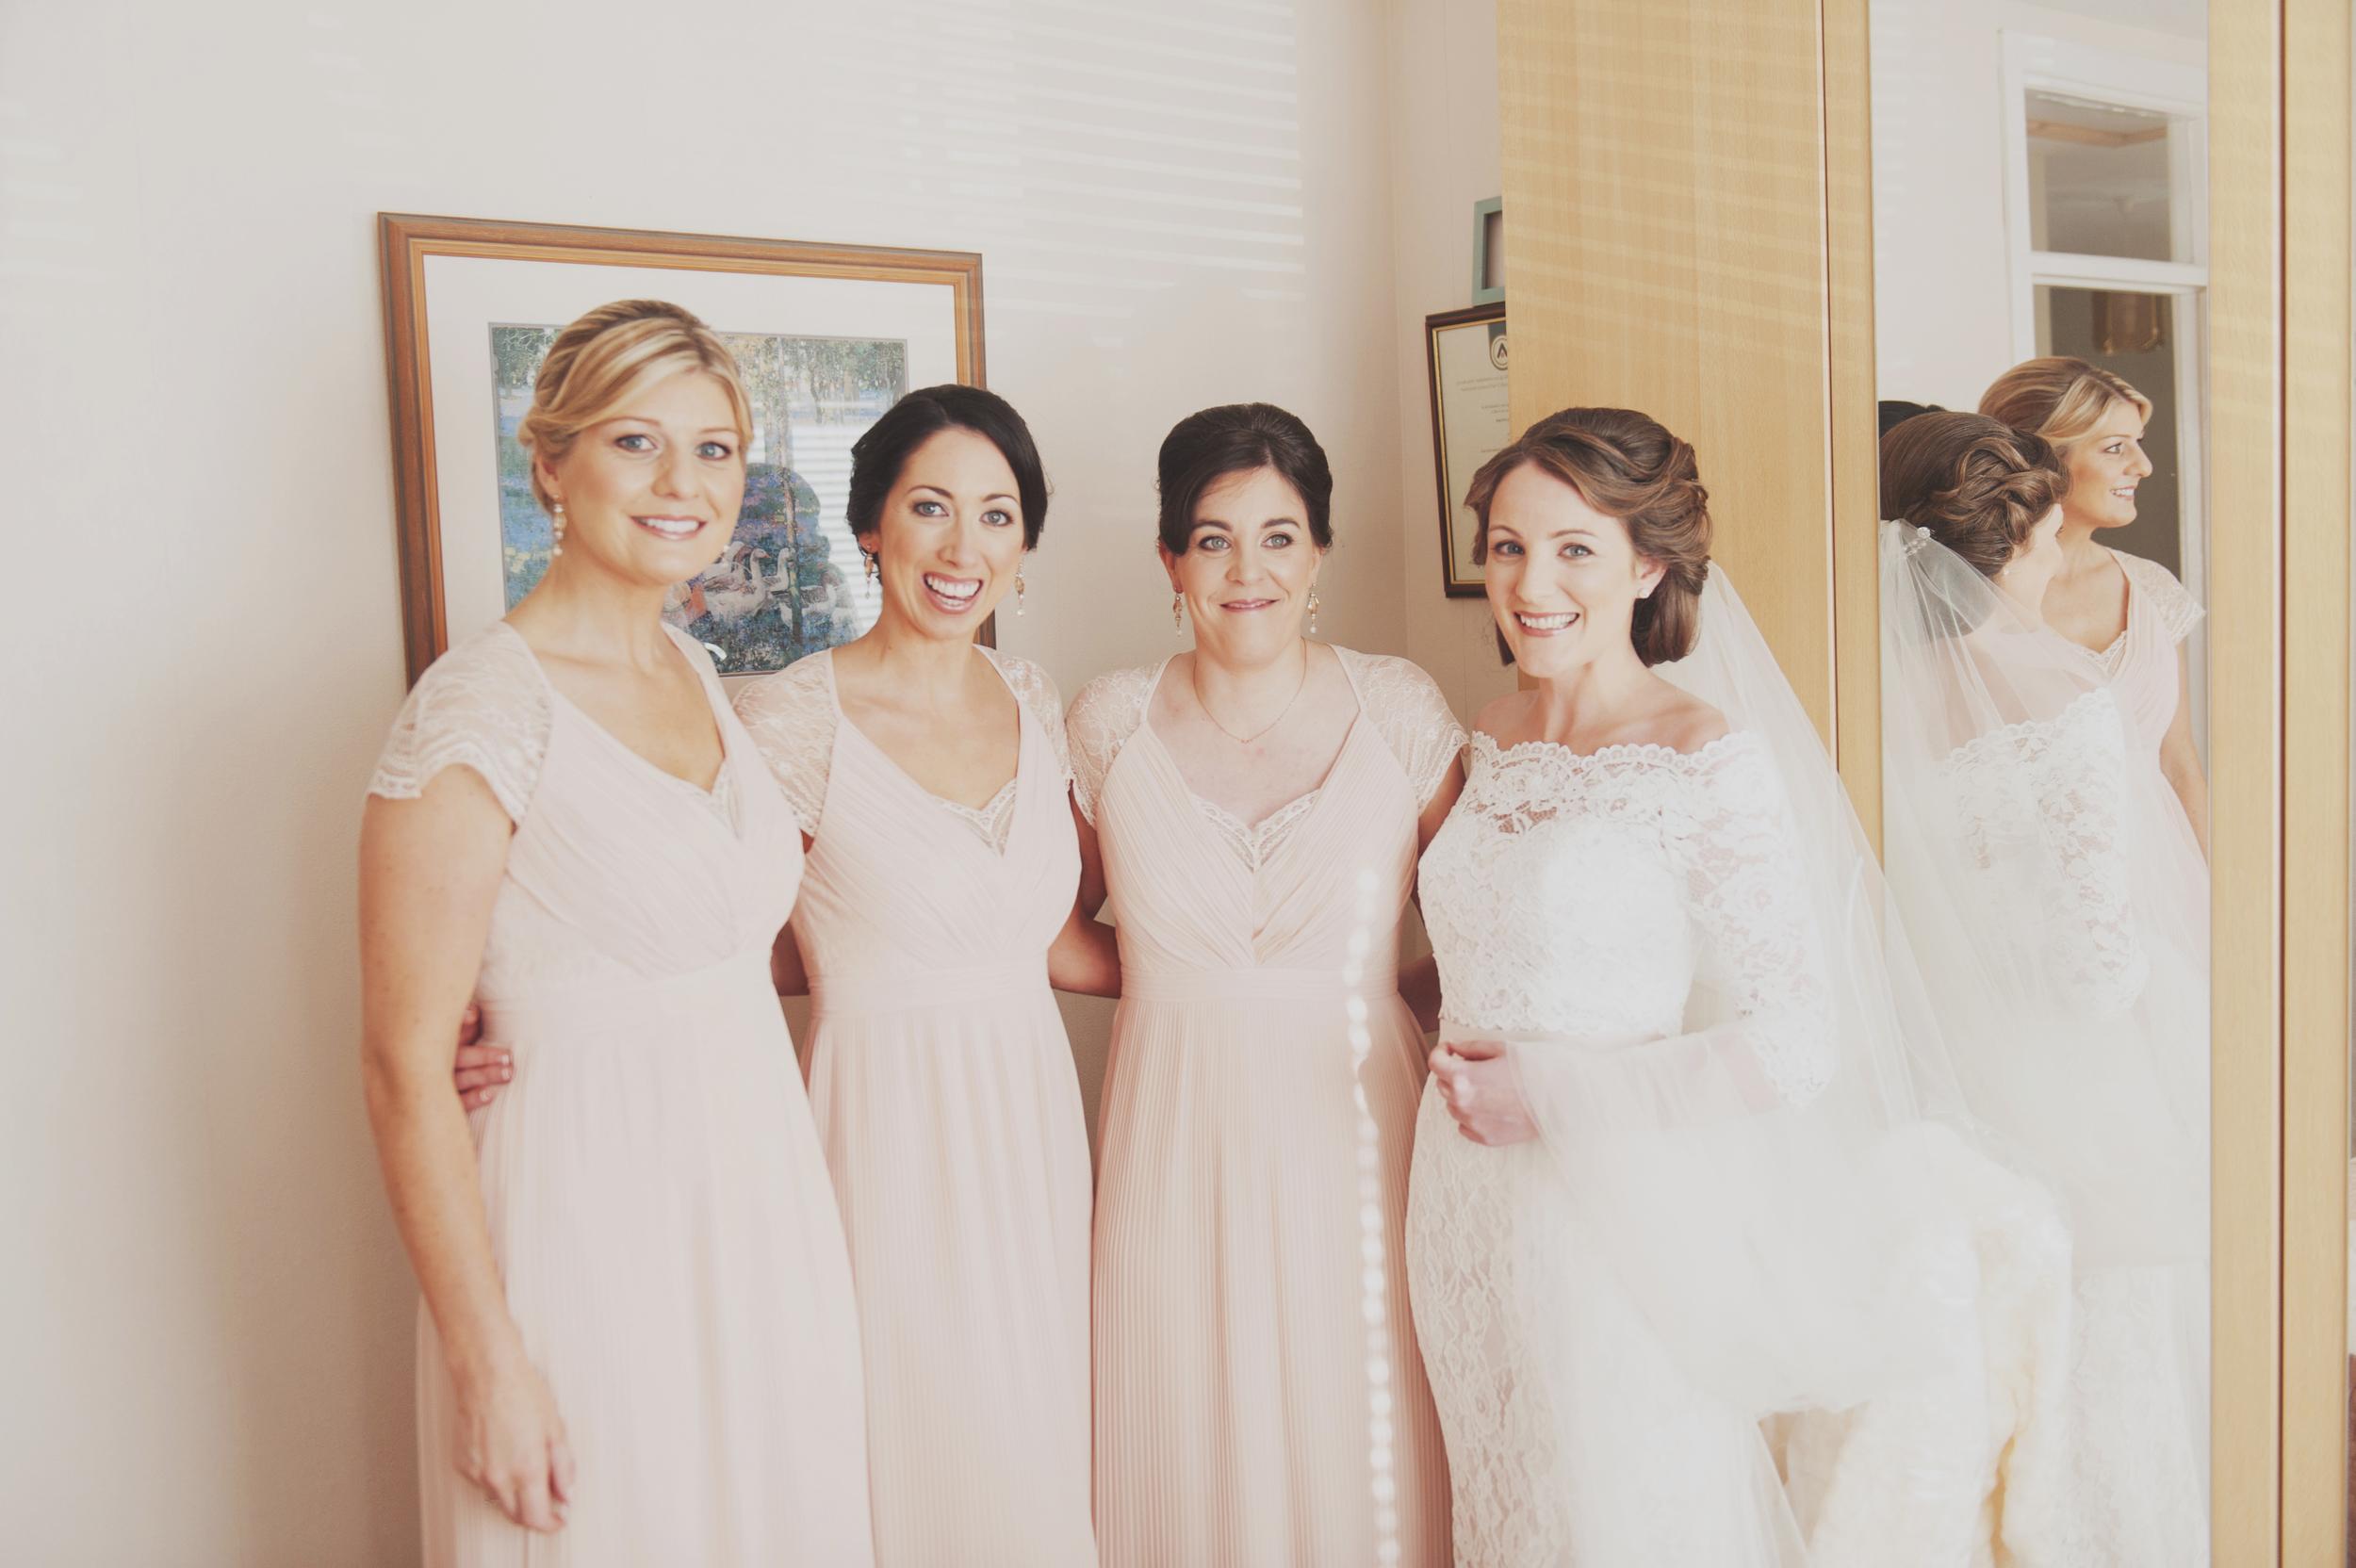 Carton_House_Wedding_Photography_Maynooth_Ireland_023.jpg